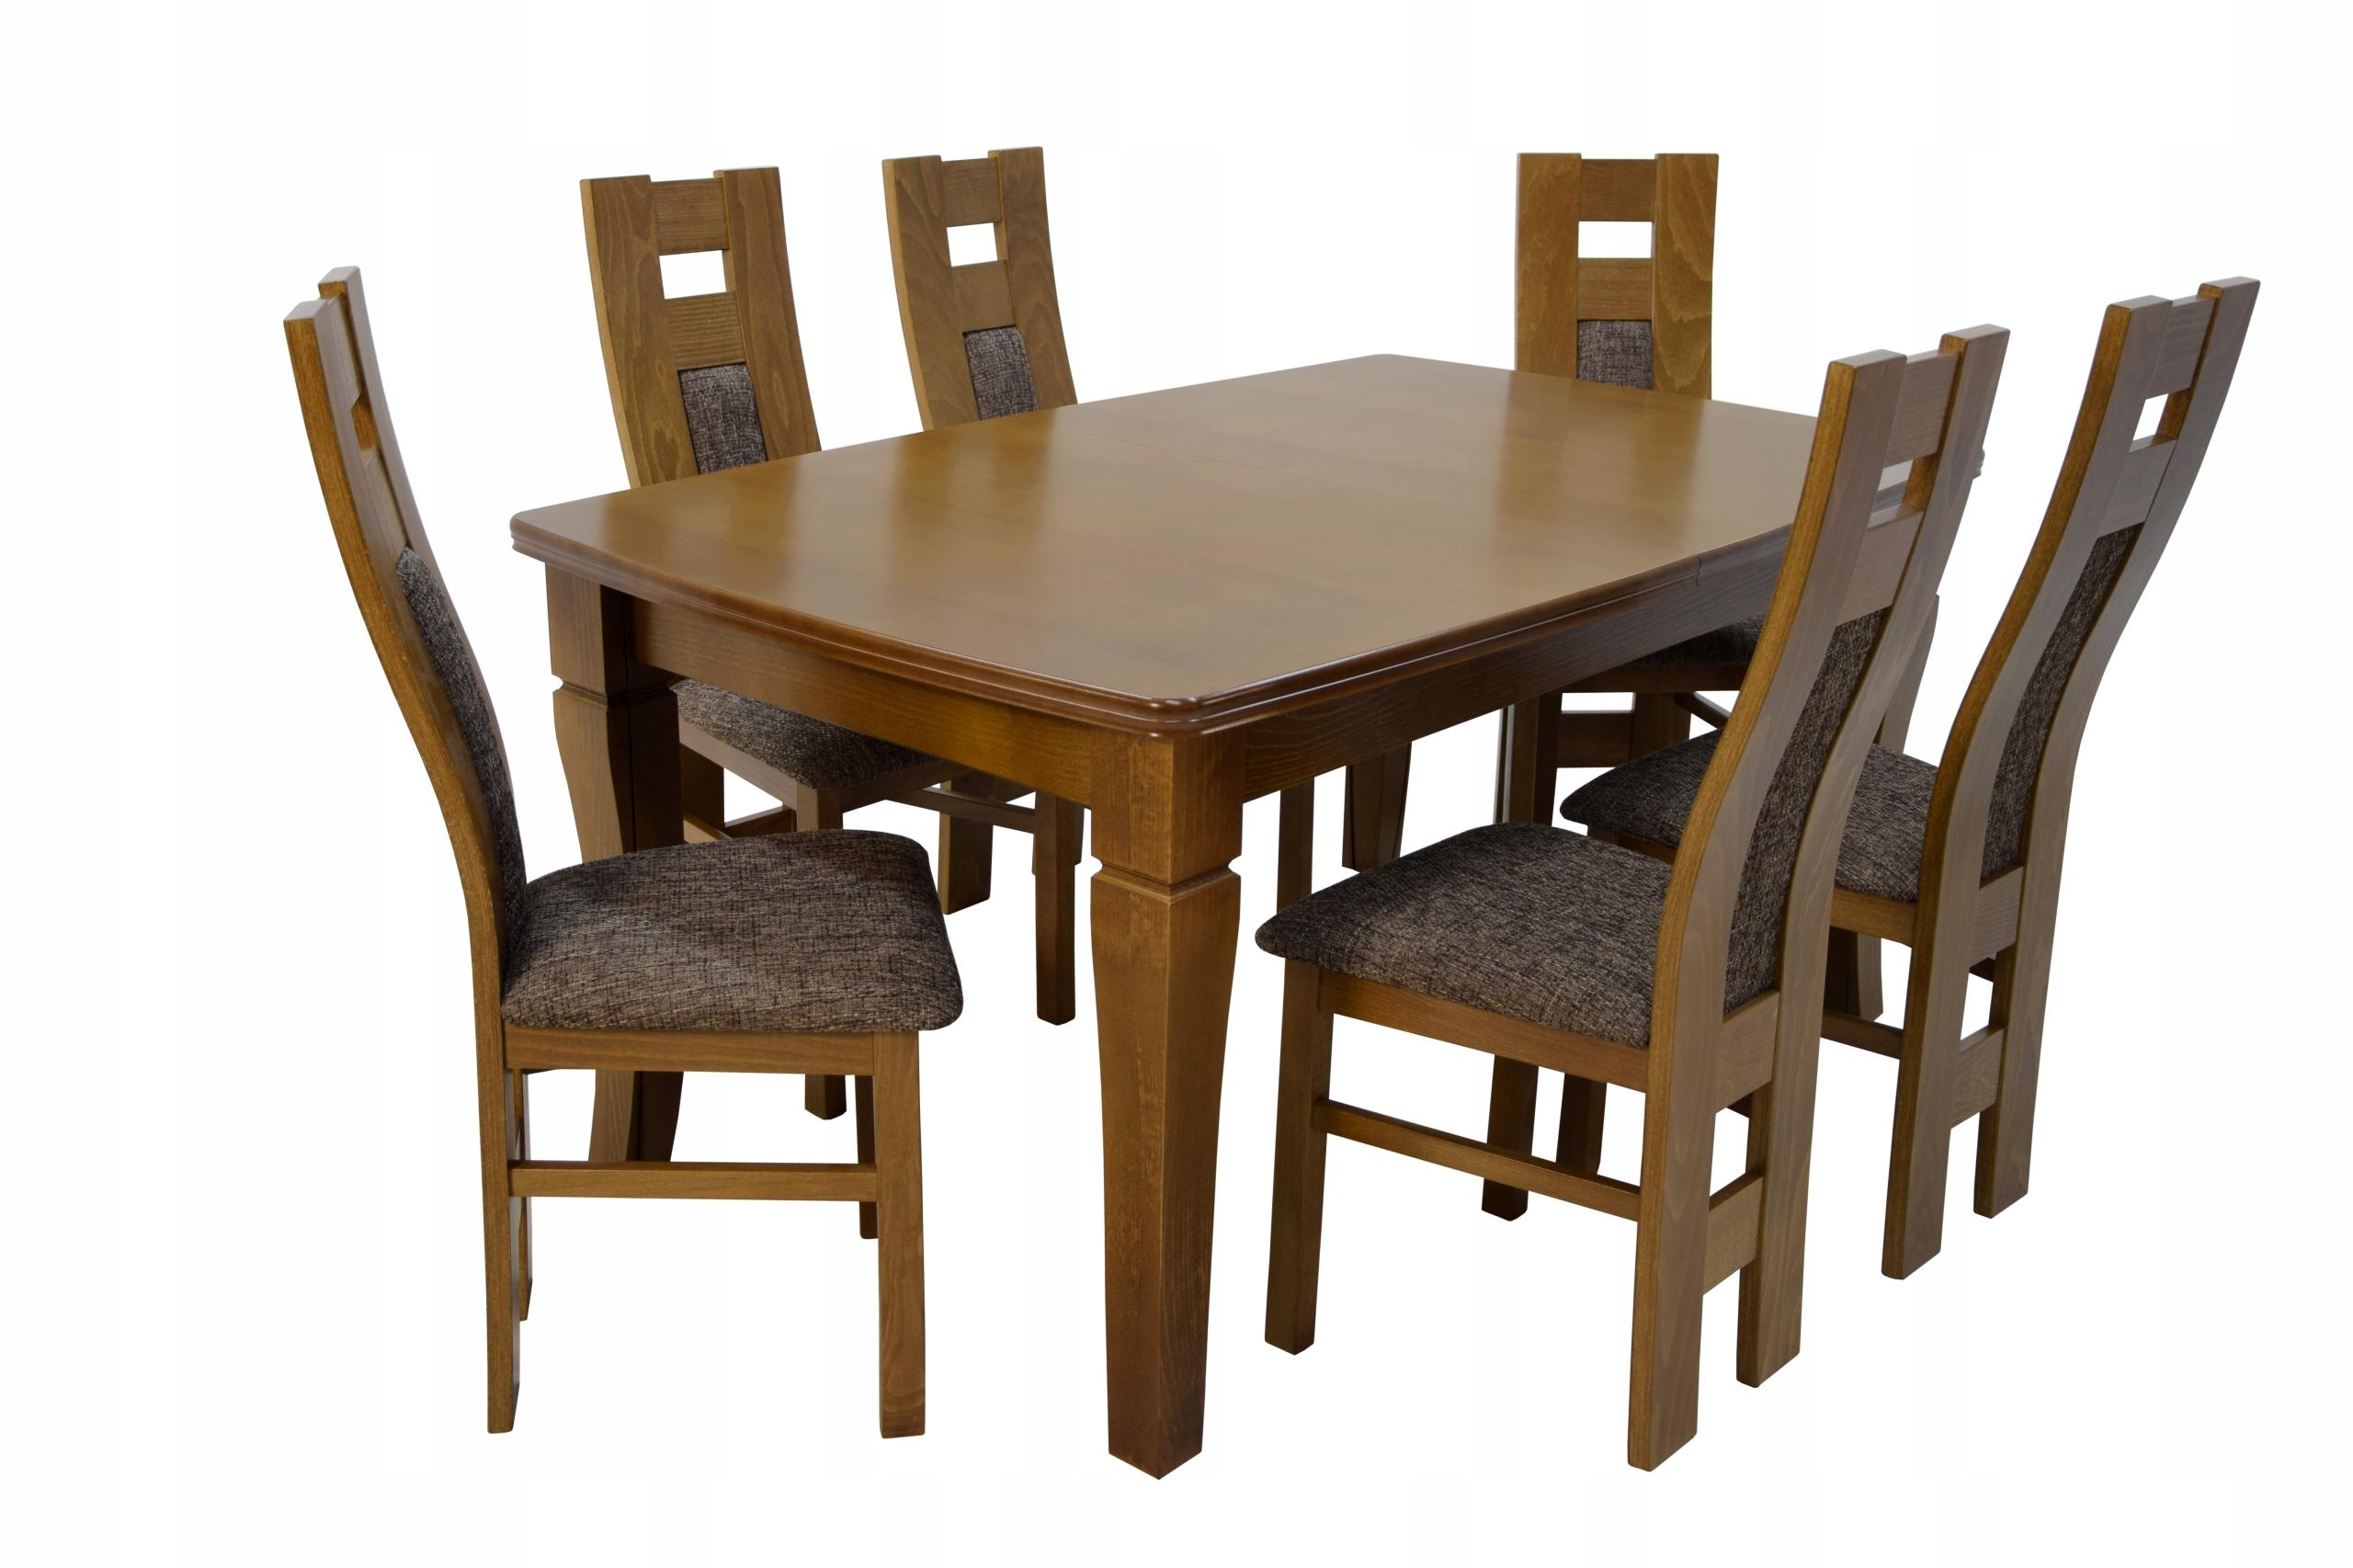 6 stoličkami a rozšírenie stola s 4 Dvojité nohy